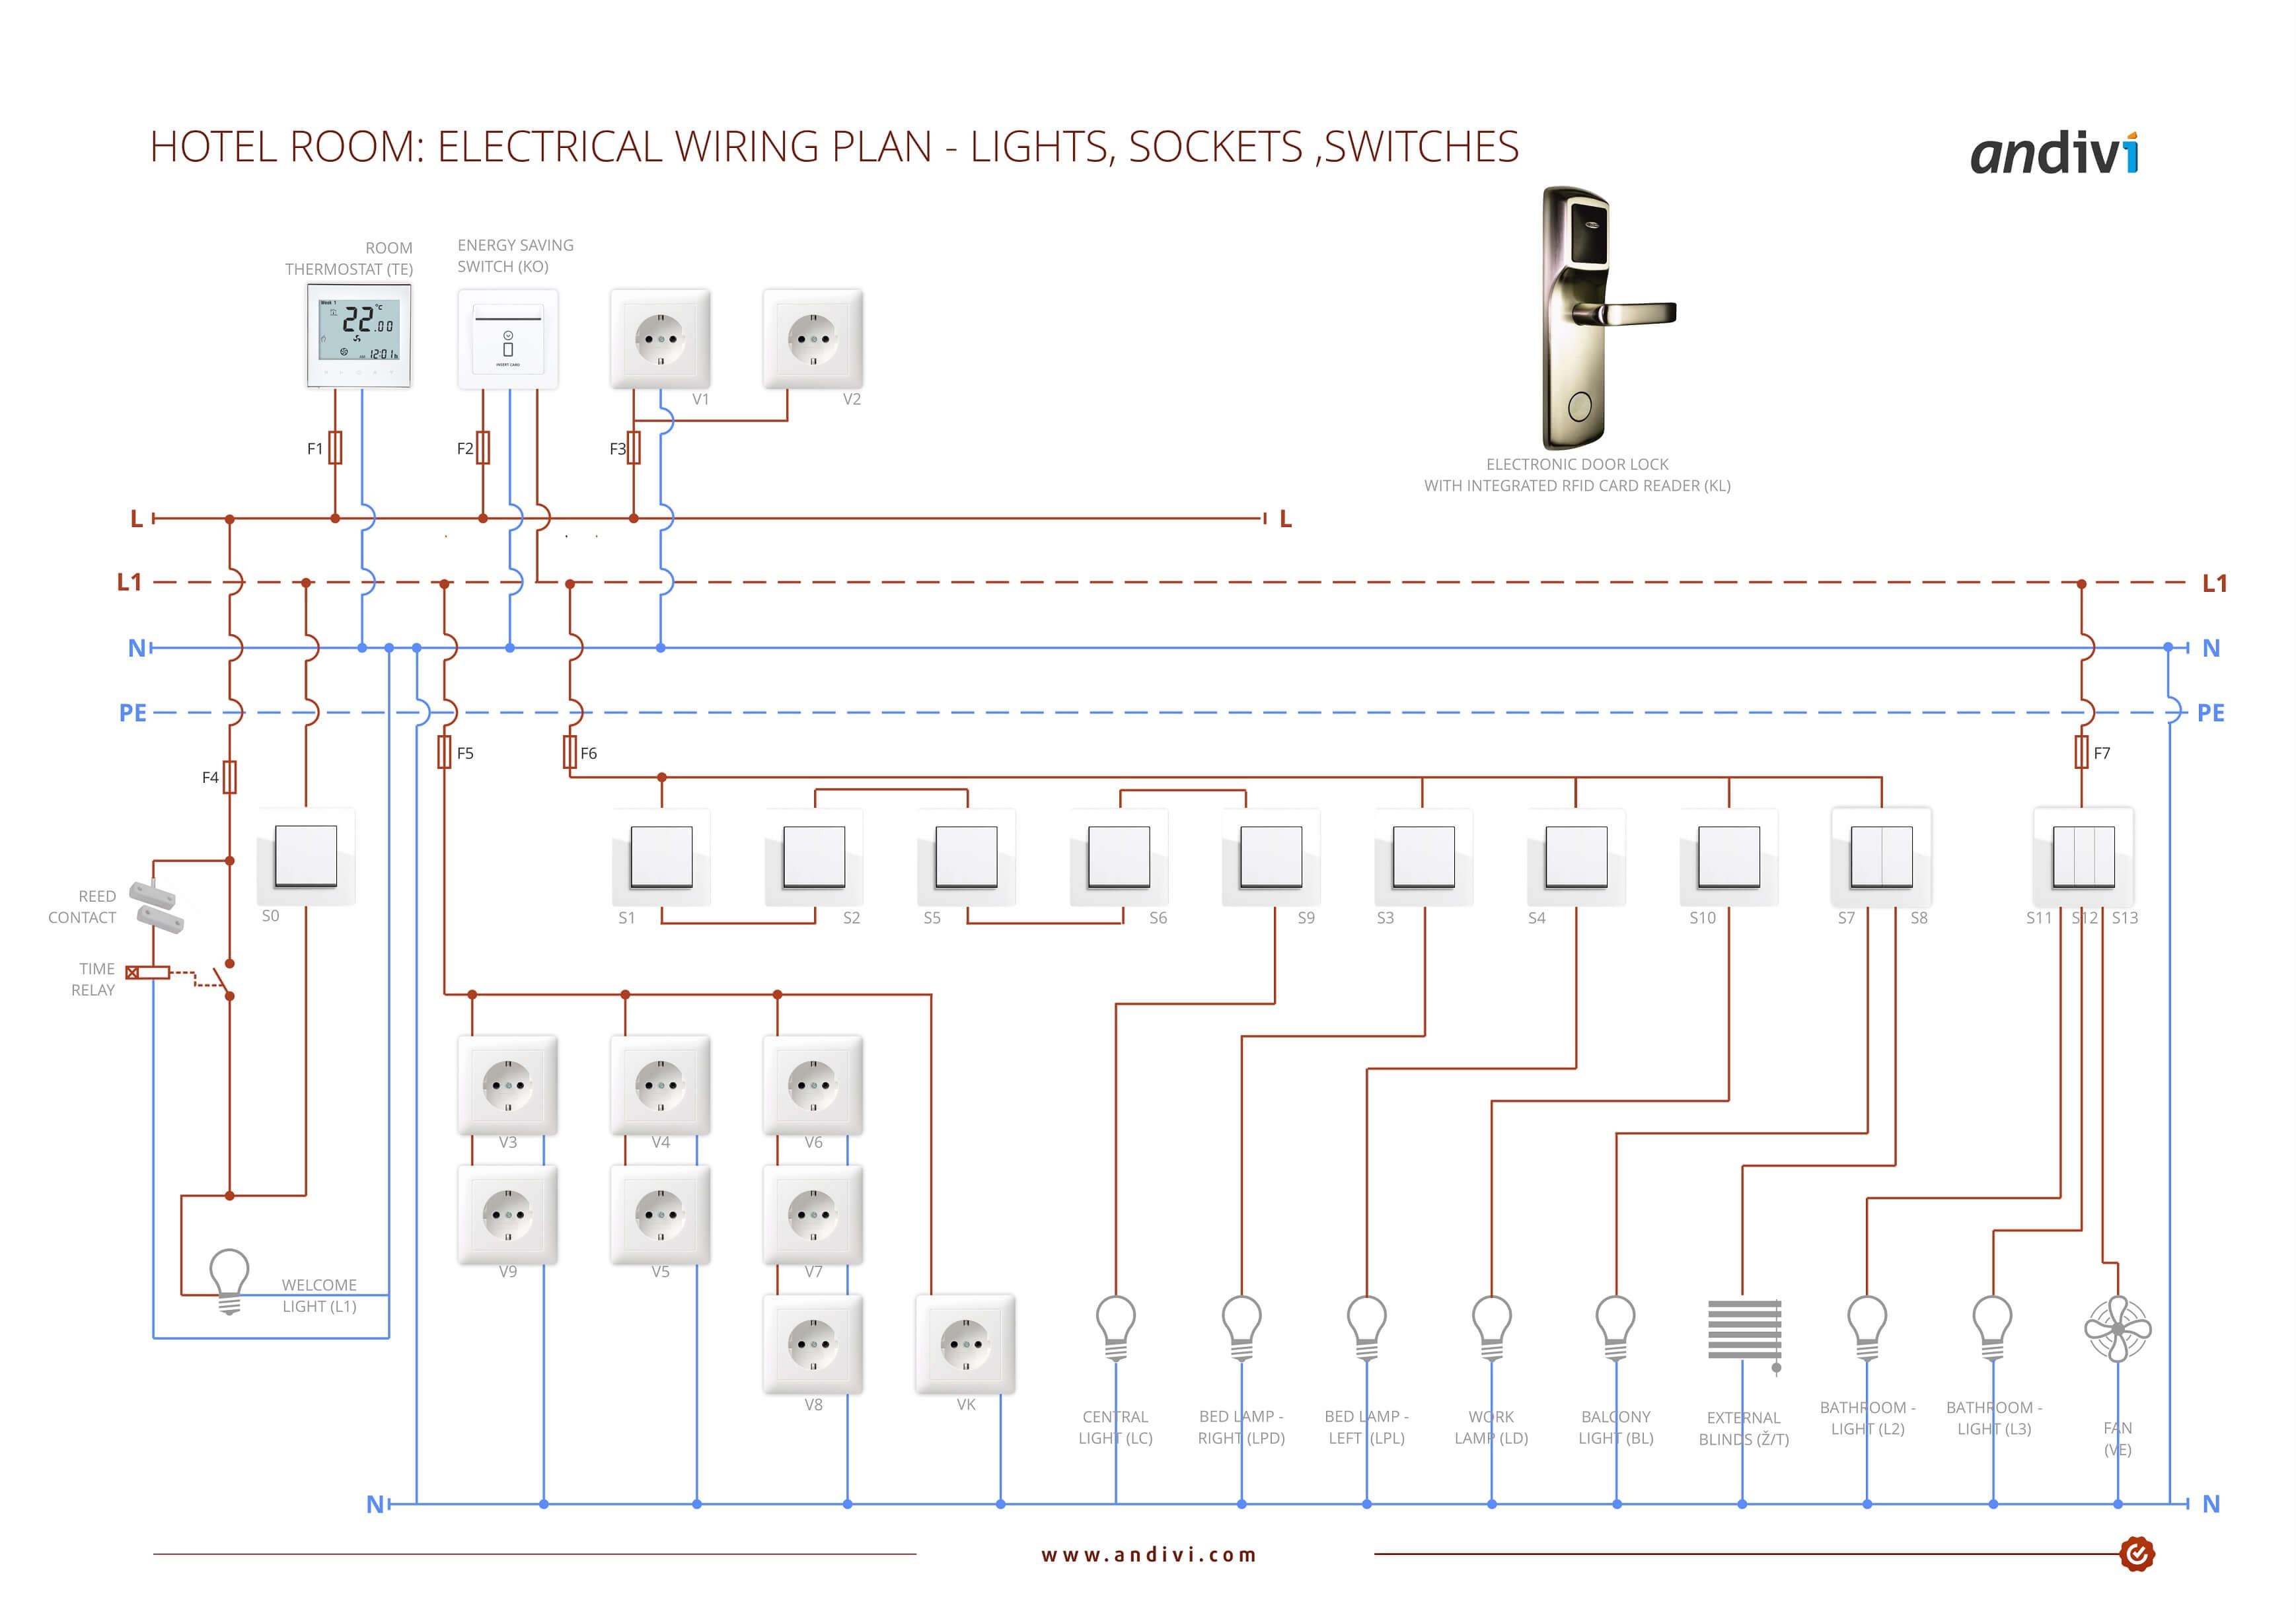 Remote Control Car Circuit Diagram Circuit Automotivecircuit Circuit Diagram Seekic Wiring Diagram Go Of Remote Control Car Circuit Diagram